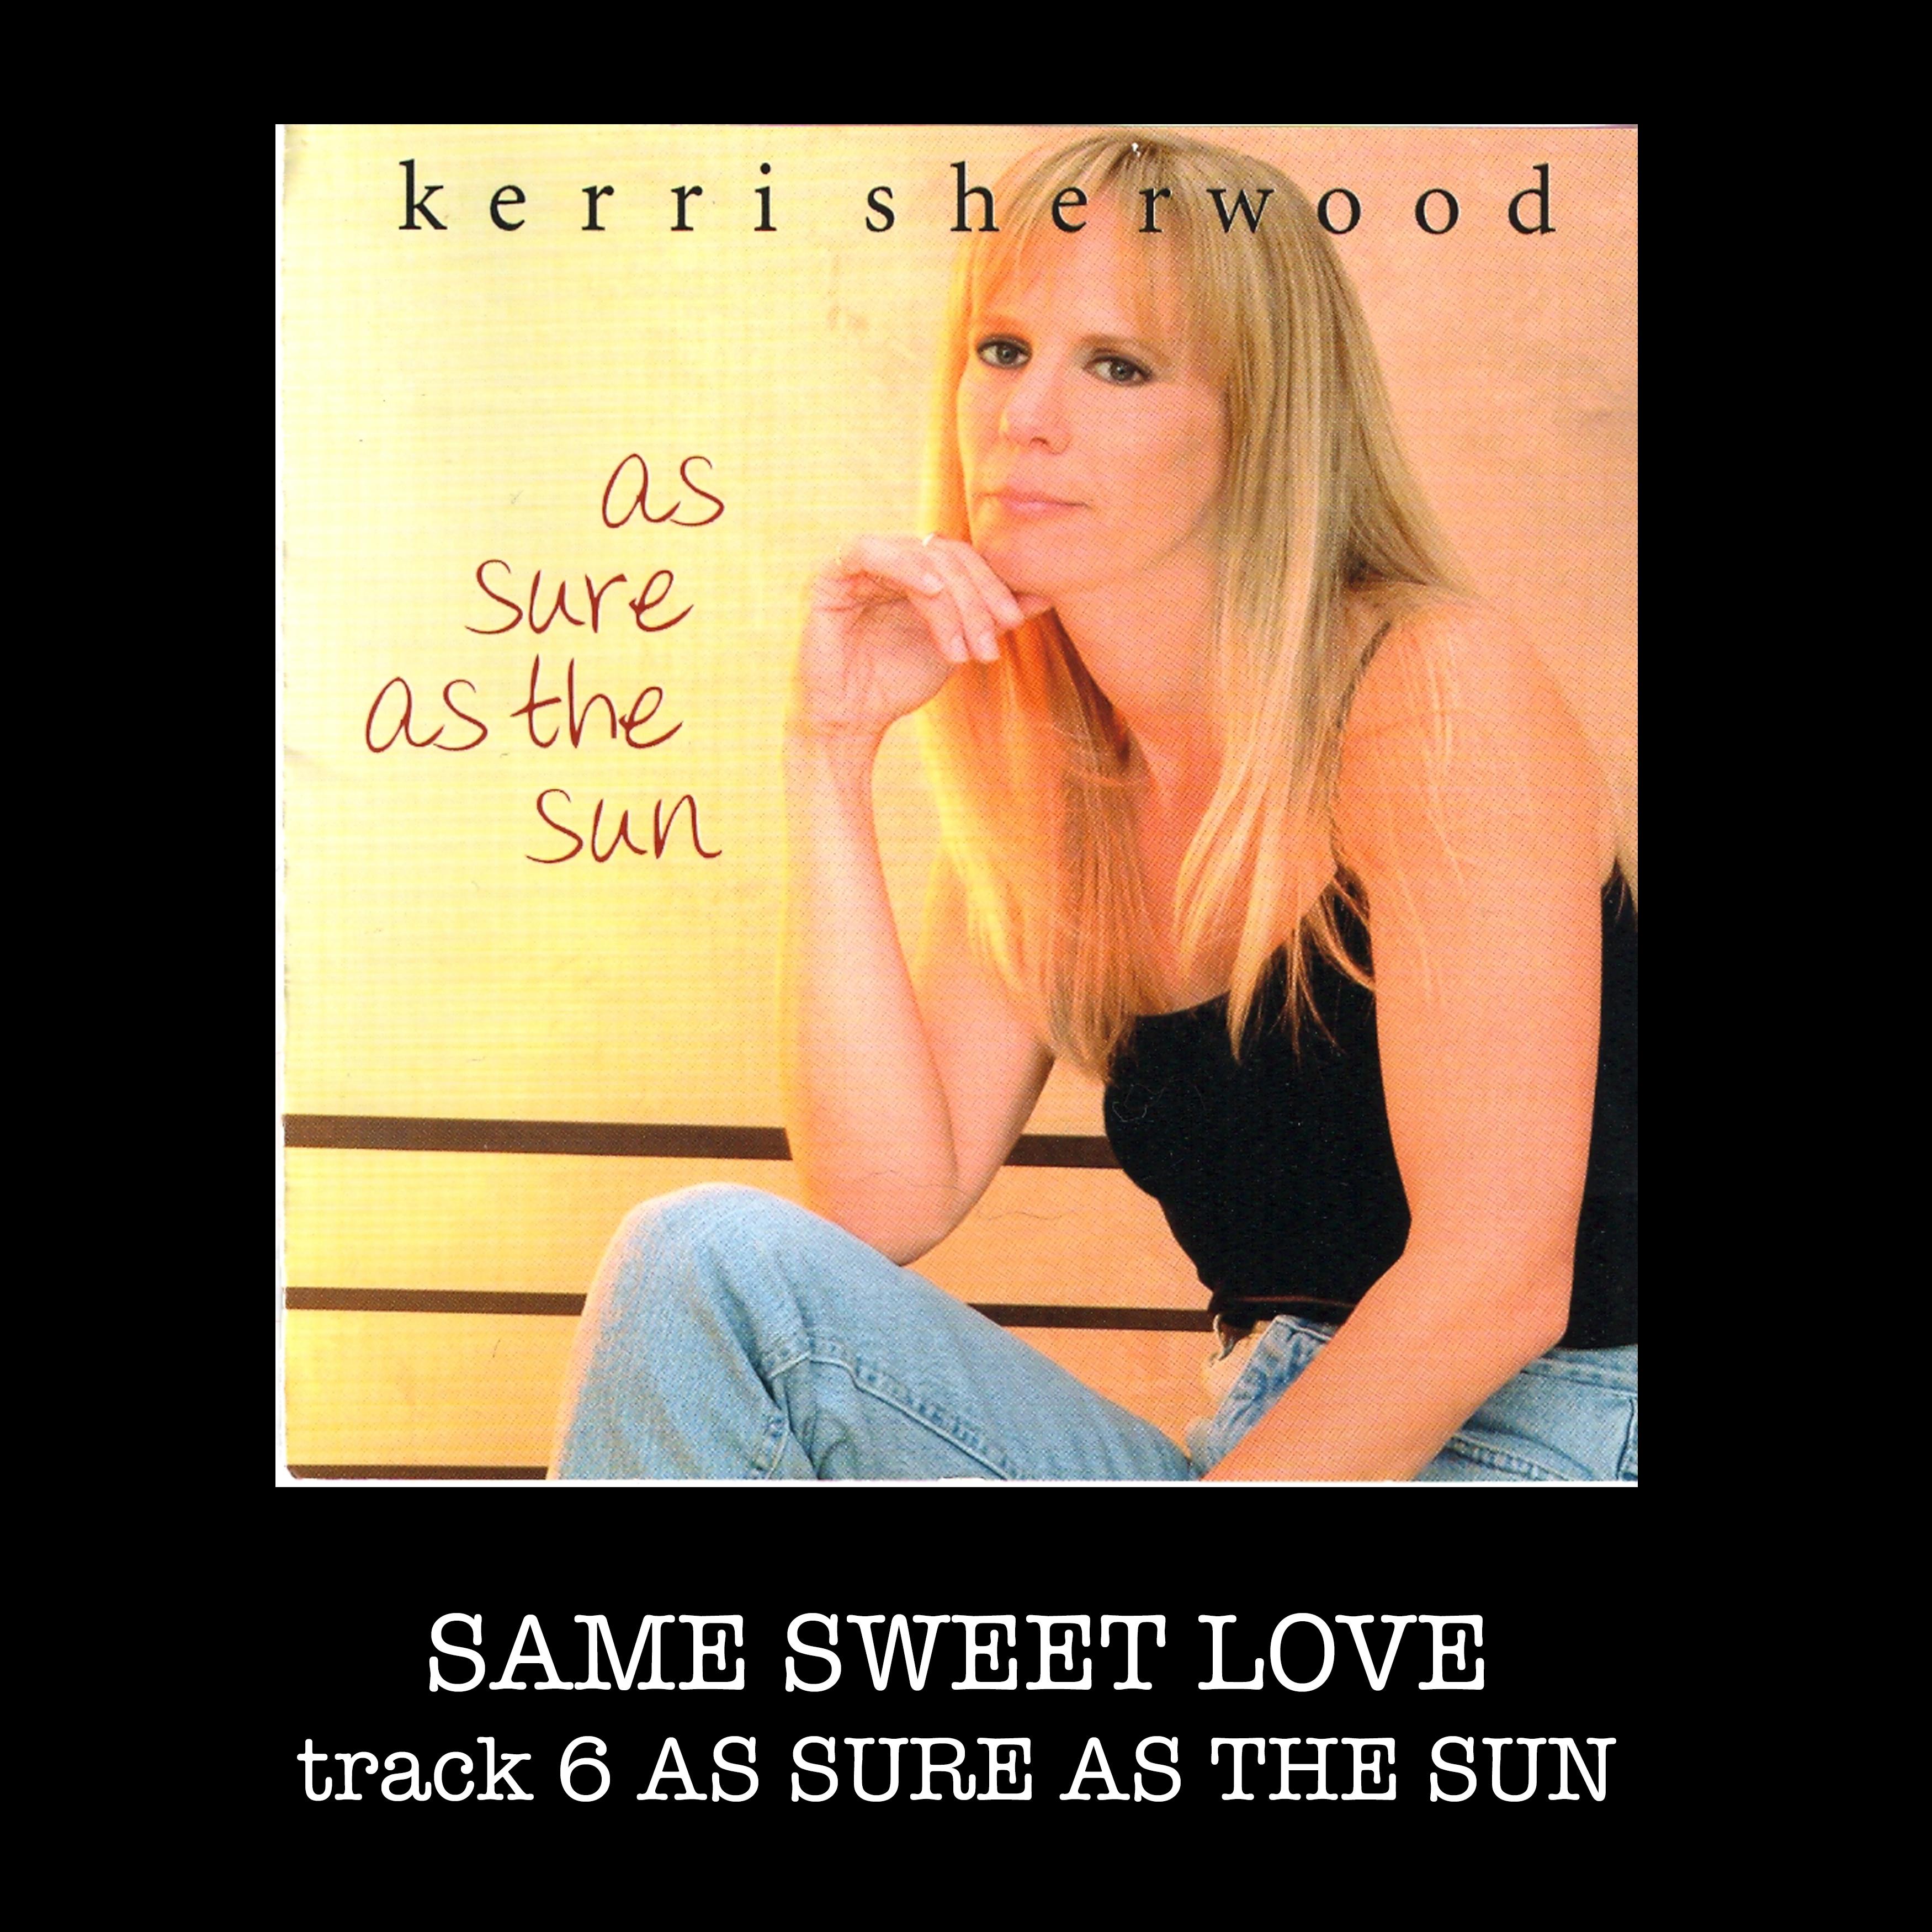 SAME SWEET LOVE SONG BOX